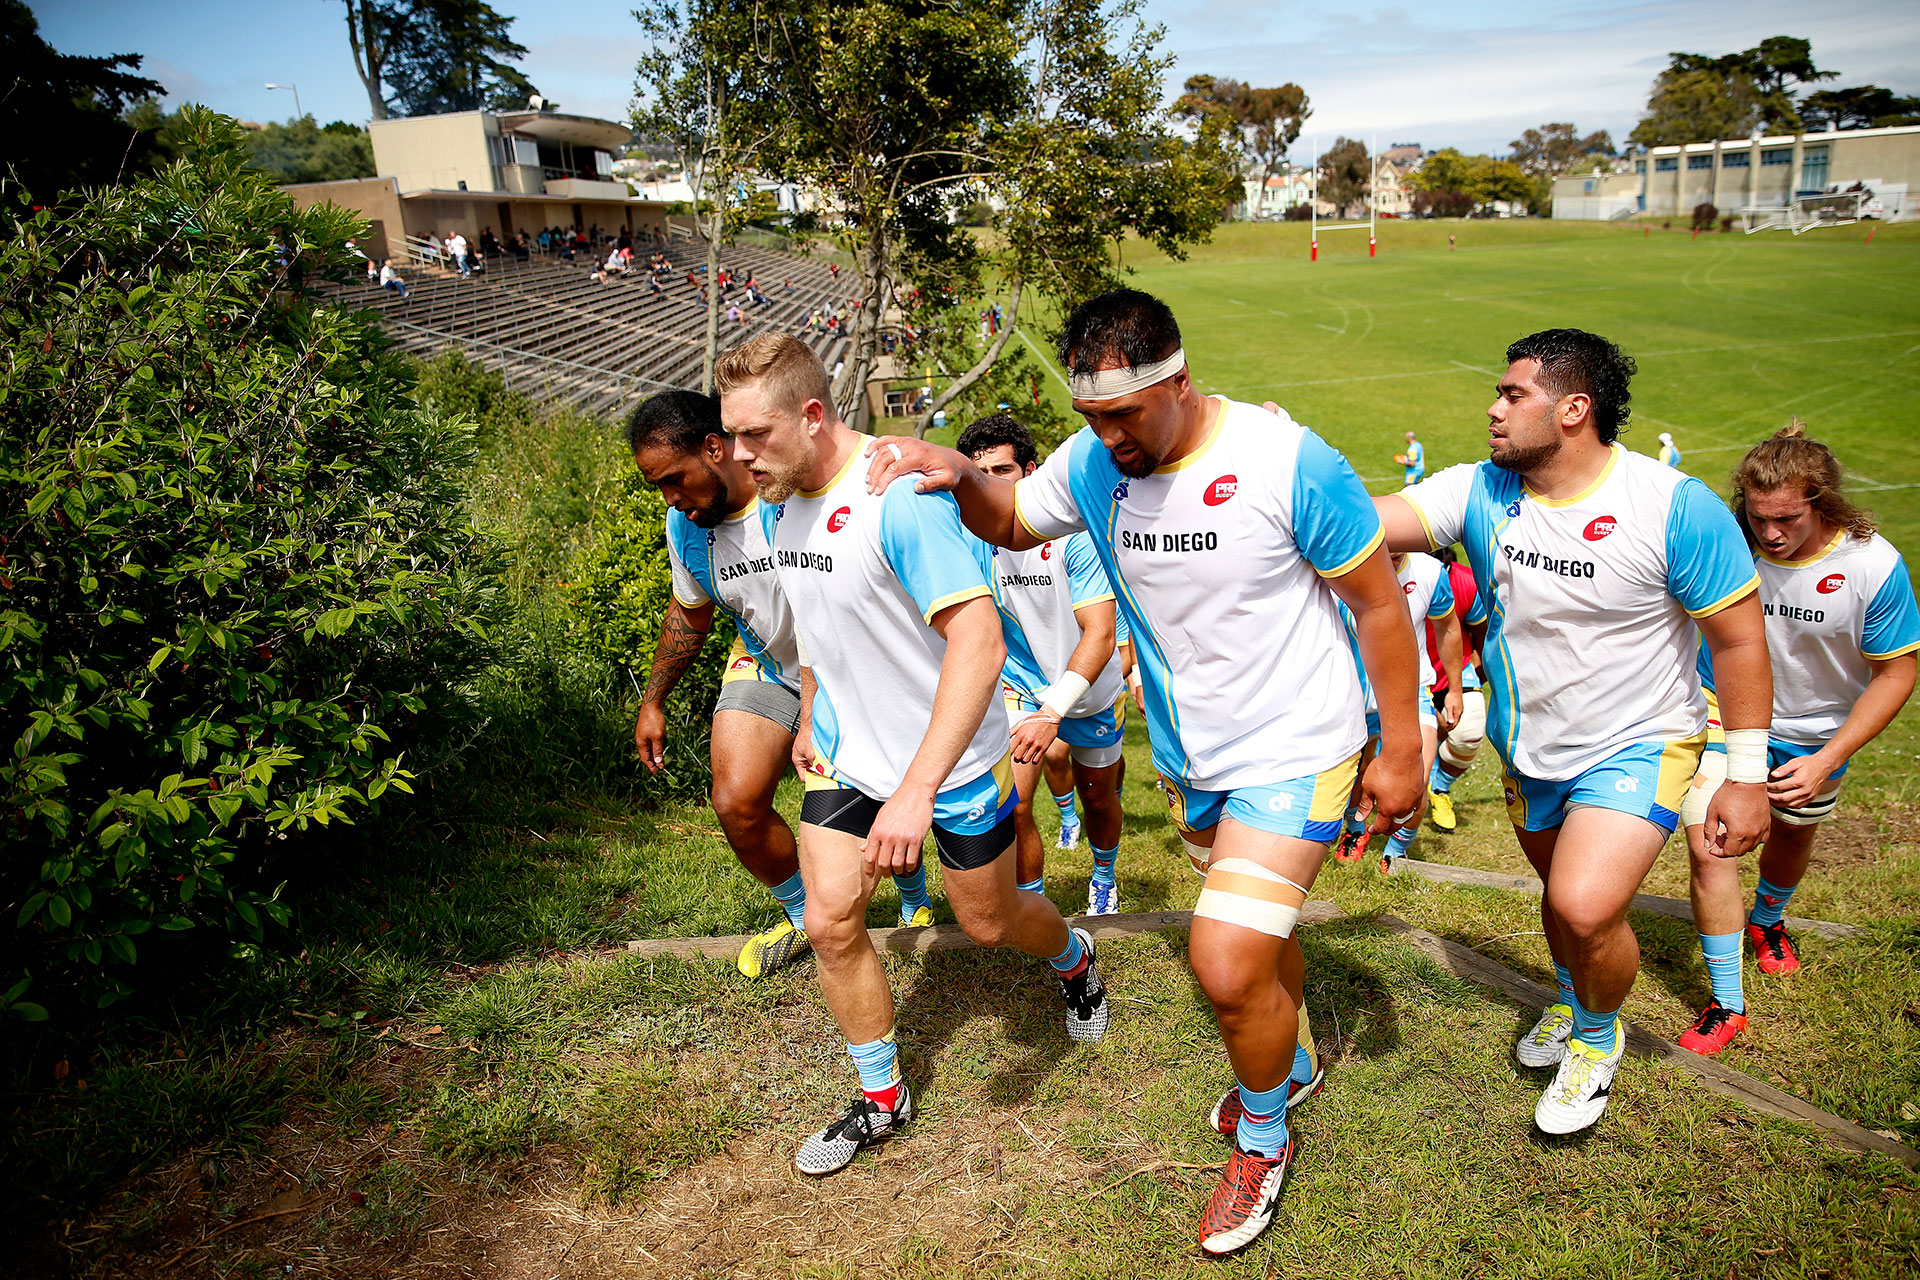 20160508_JJ_PRO_Rugby_SD_1430-copy